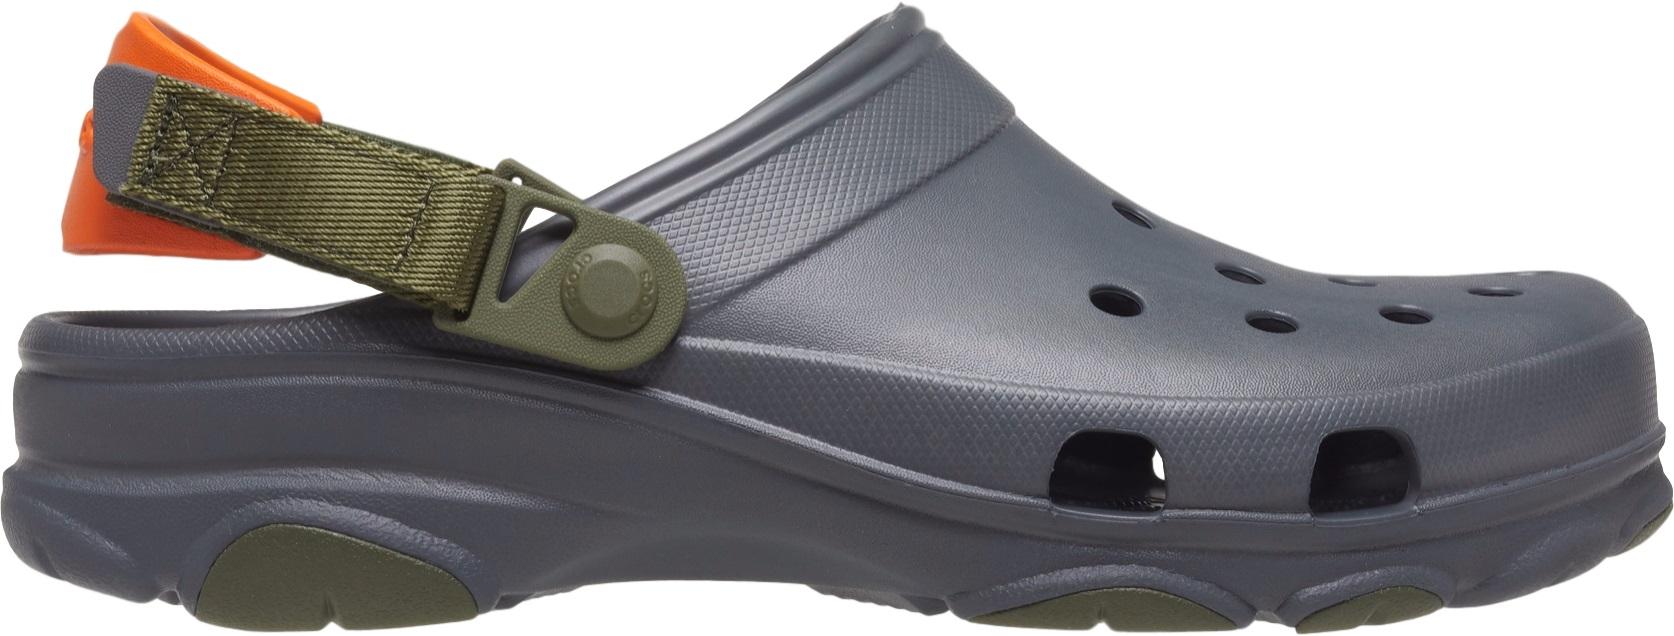 Crocs™ Classic All Terrain Clog Slate Grey/Multi 47,5